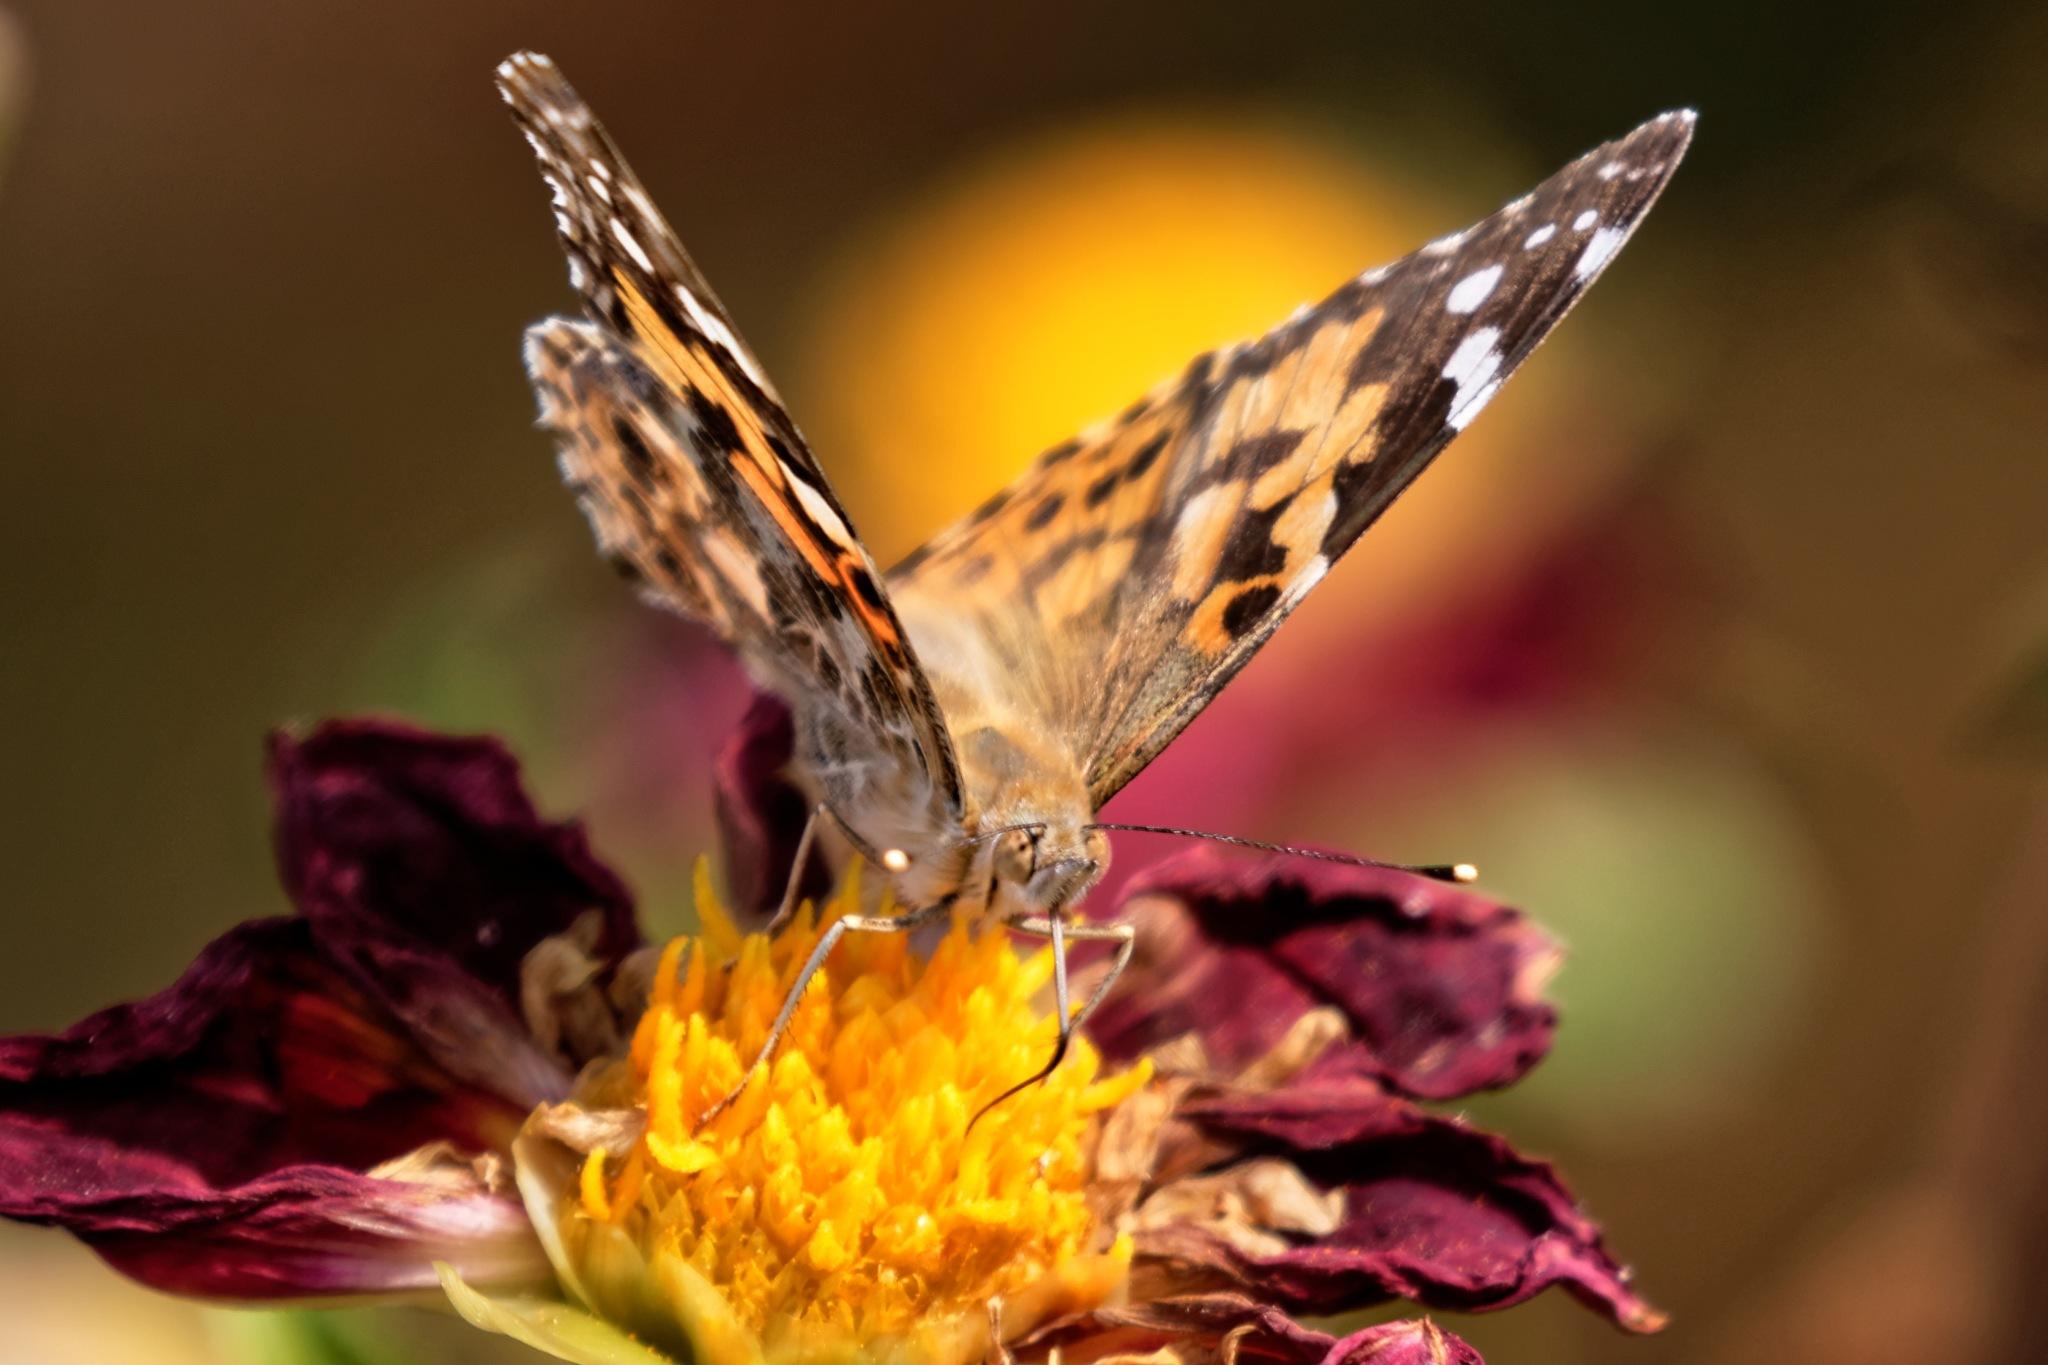 Butterfly 887 by RaphaelRaCcoon